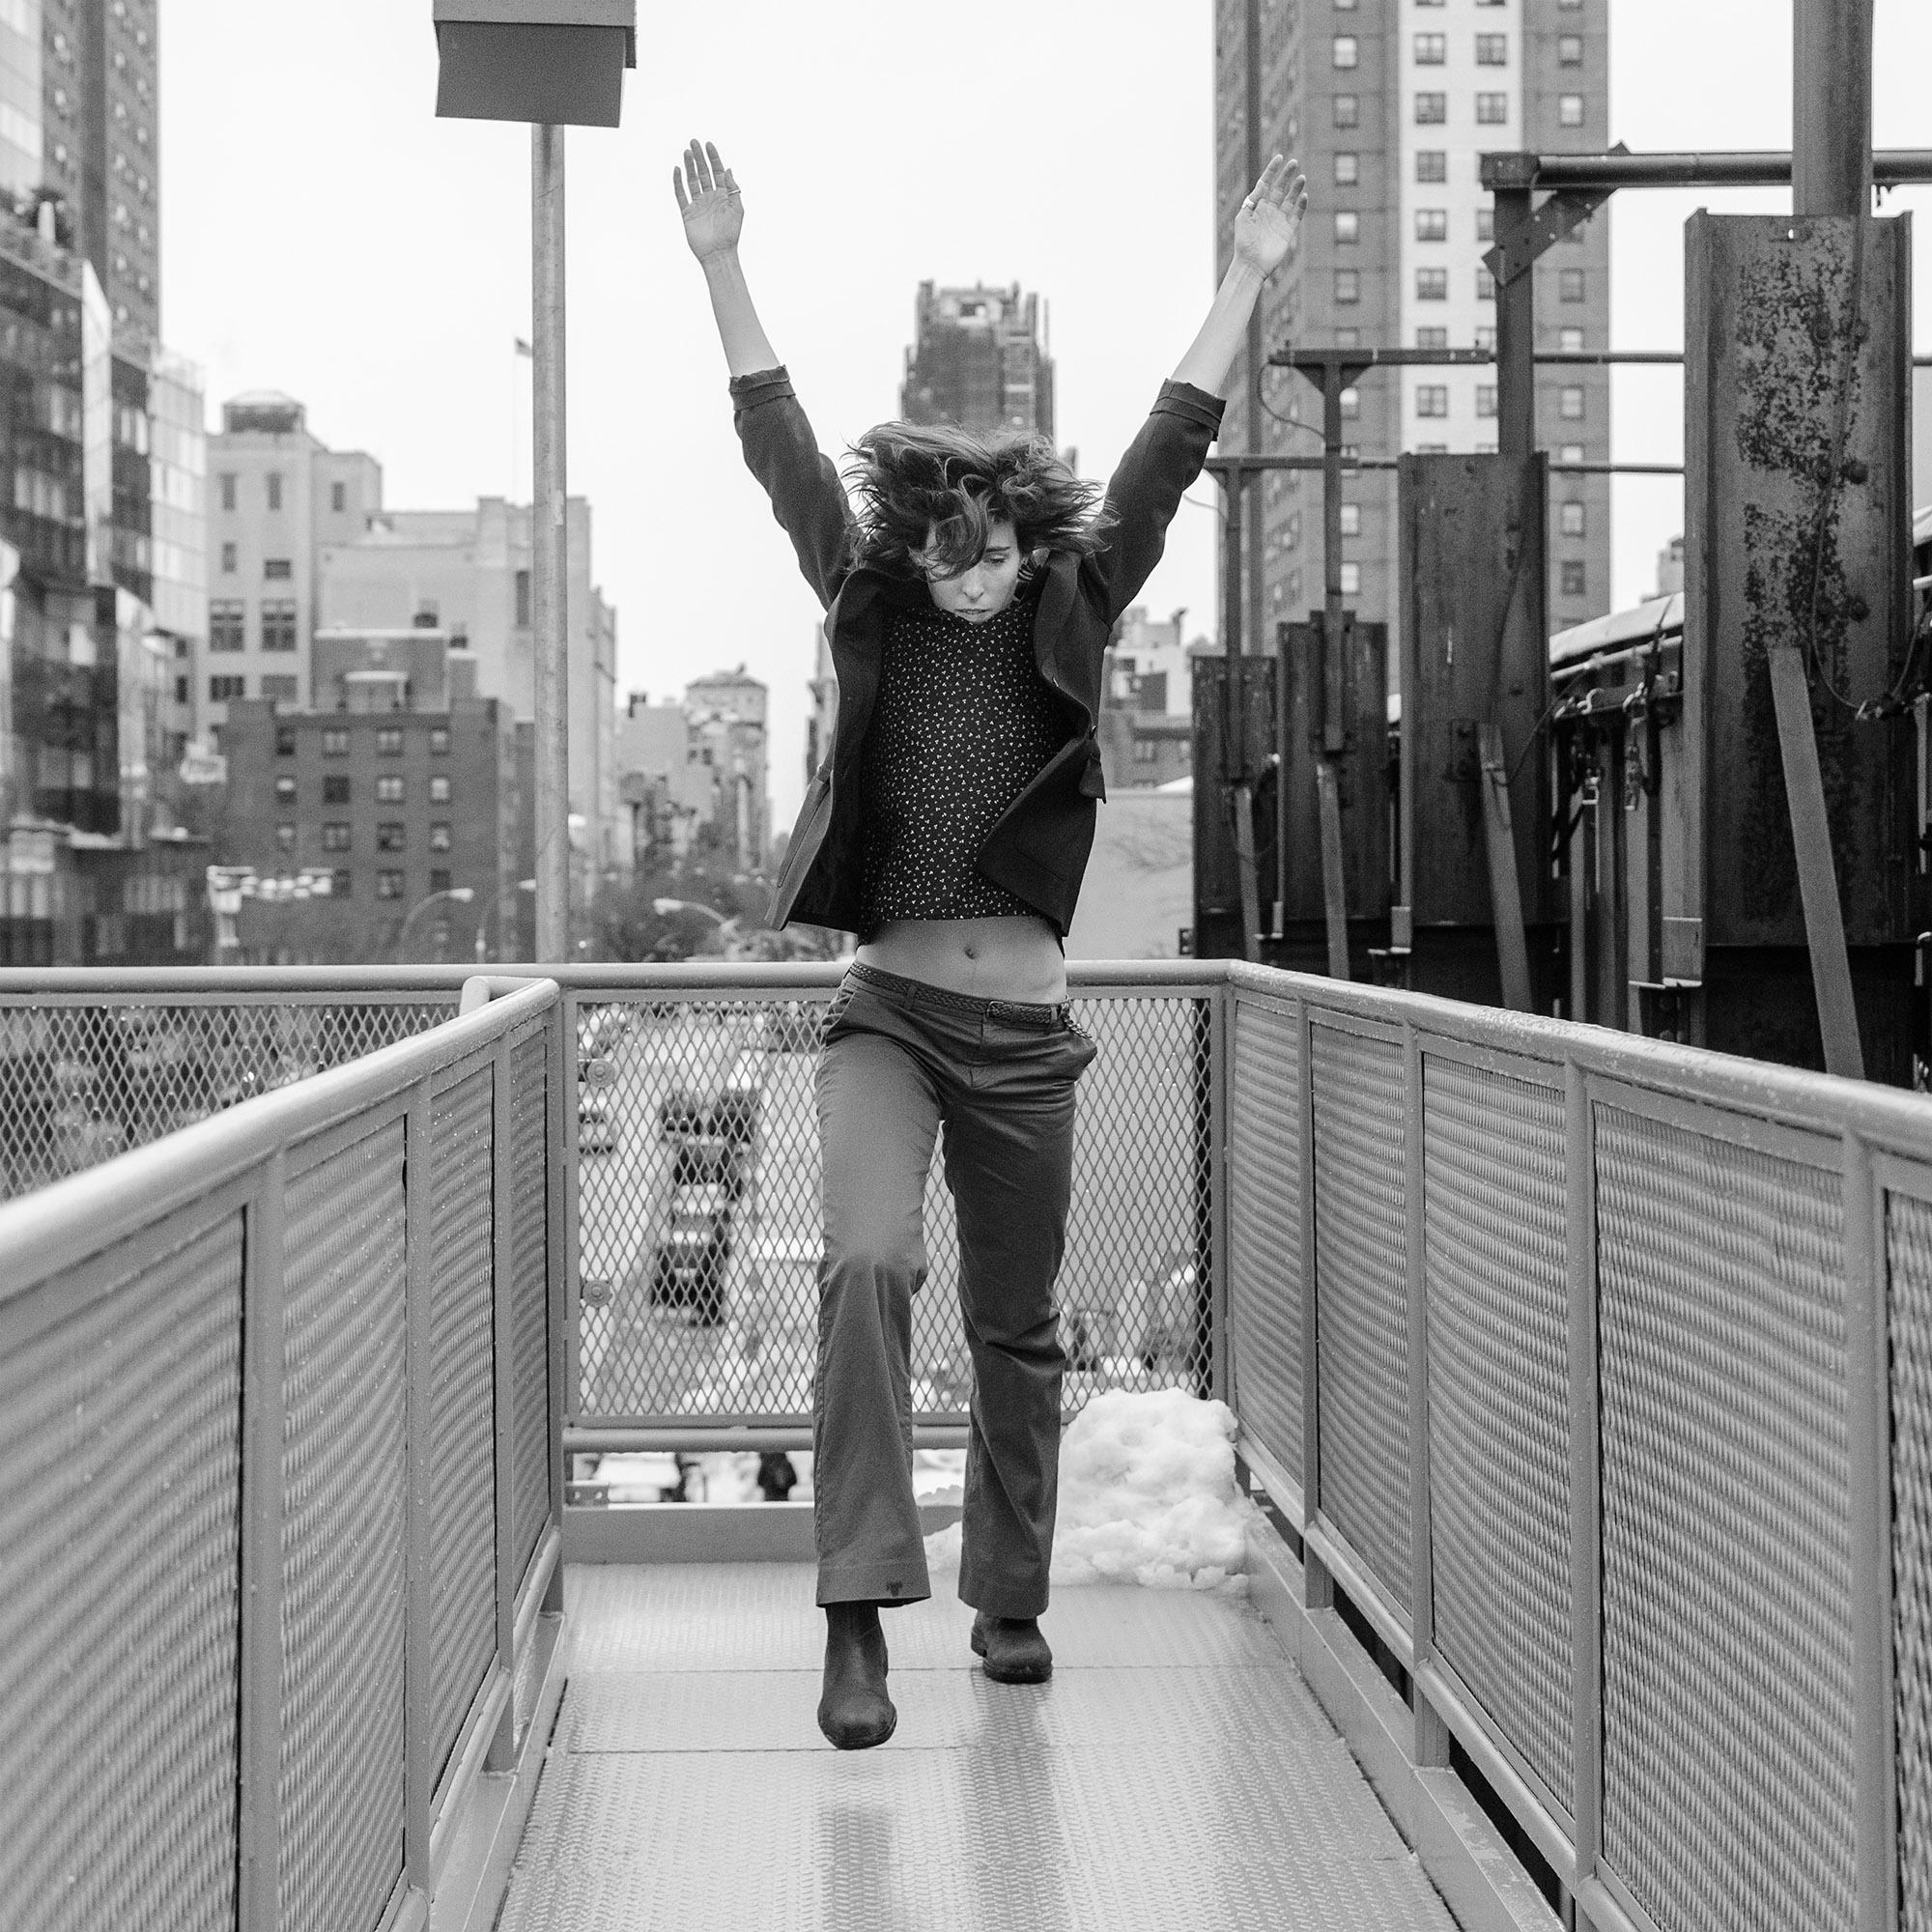 'HIGH LIFE'1st edition 120 X 120cm BRUSHED ALUMINUM, B&W, 2  013, the Hig  h Line, NEW YORK   CITY, USA, dancer: Julia Burrer